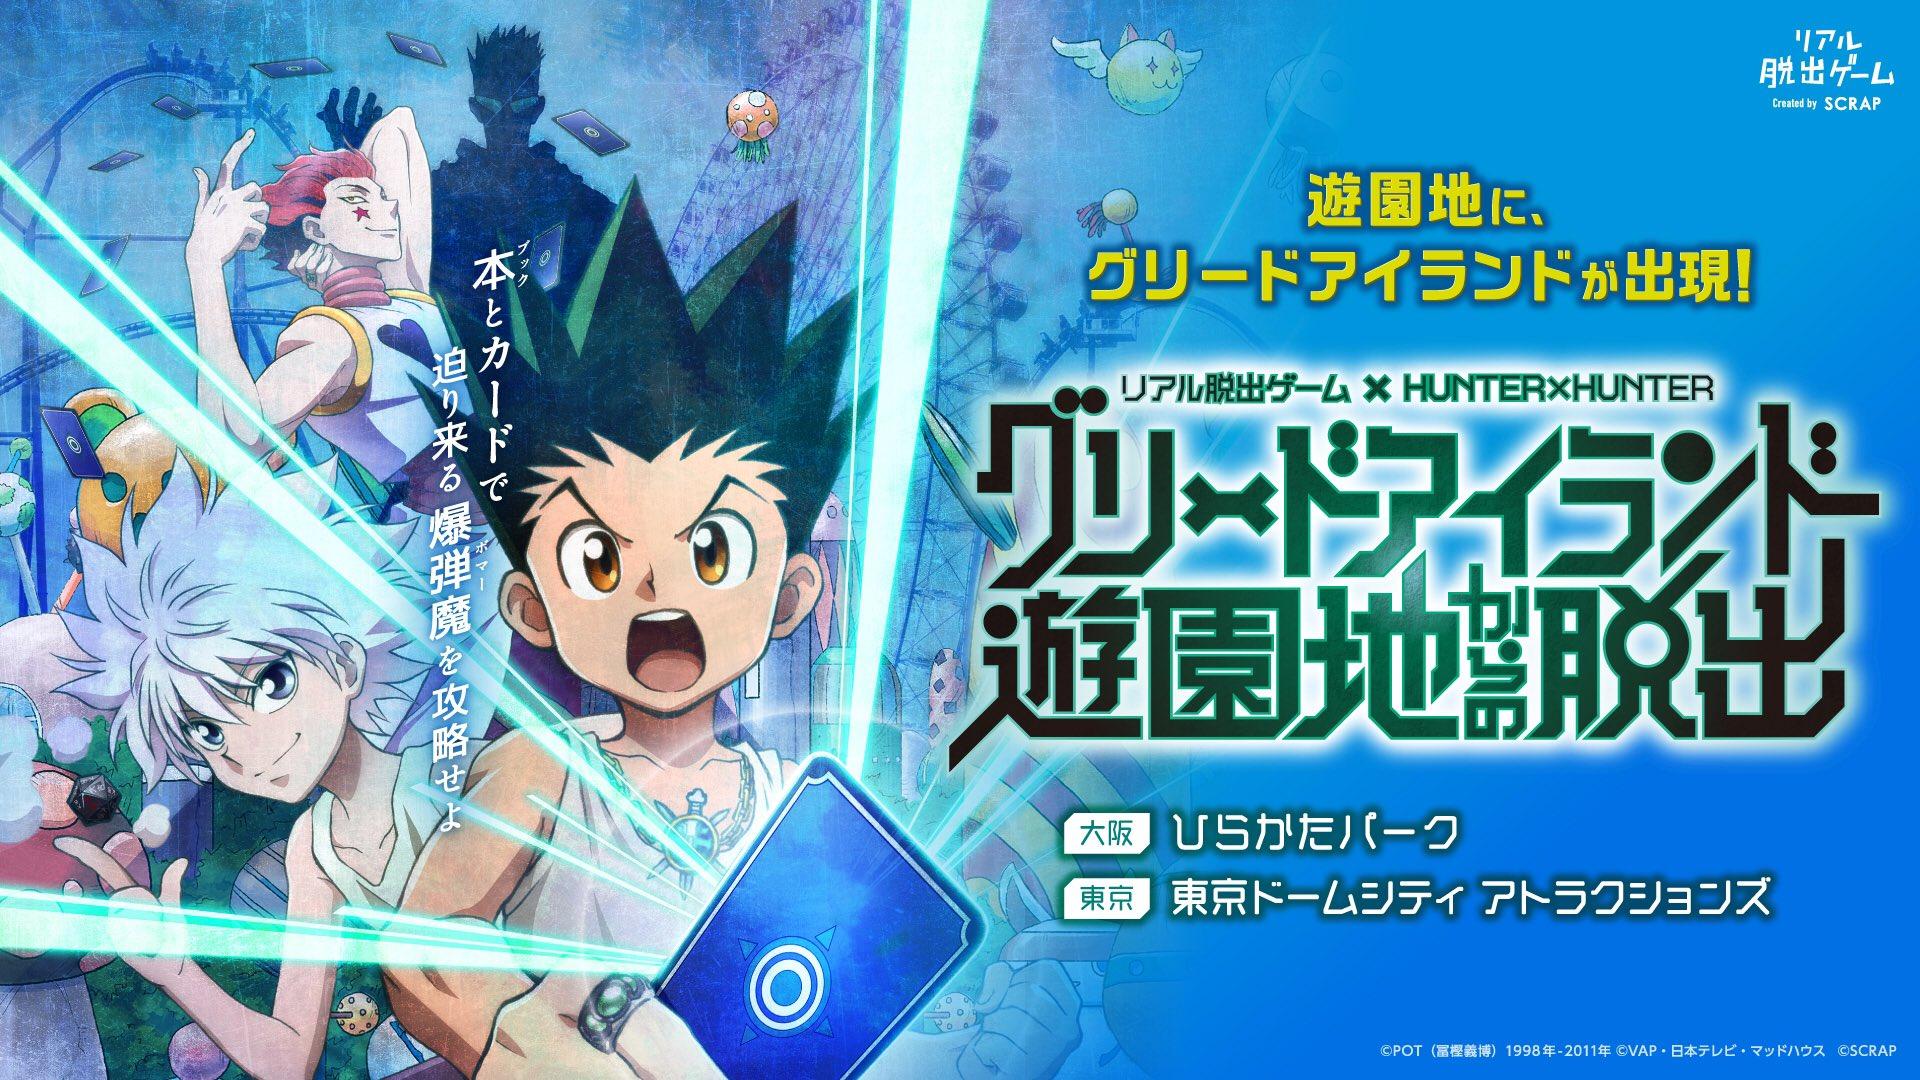 『HUNTER×HUNTER』リアル脱出ゲームが東京ドームシティで開催!アニメキャストの録り下ろしボイス&サブミッションも登場